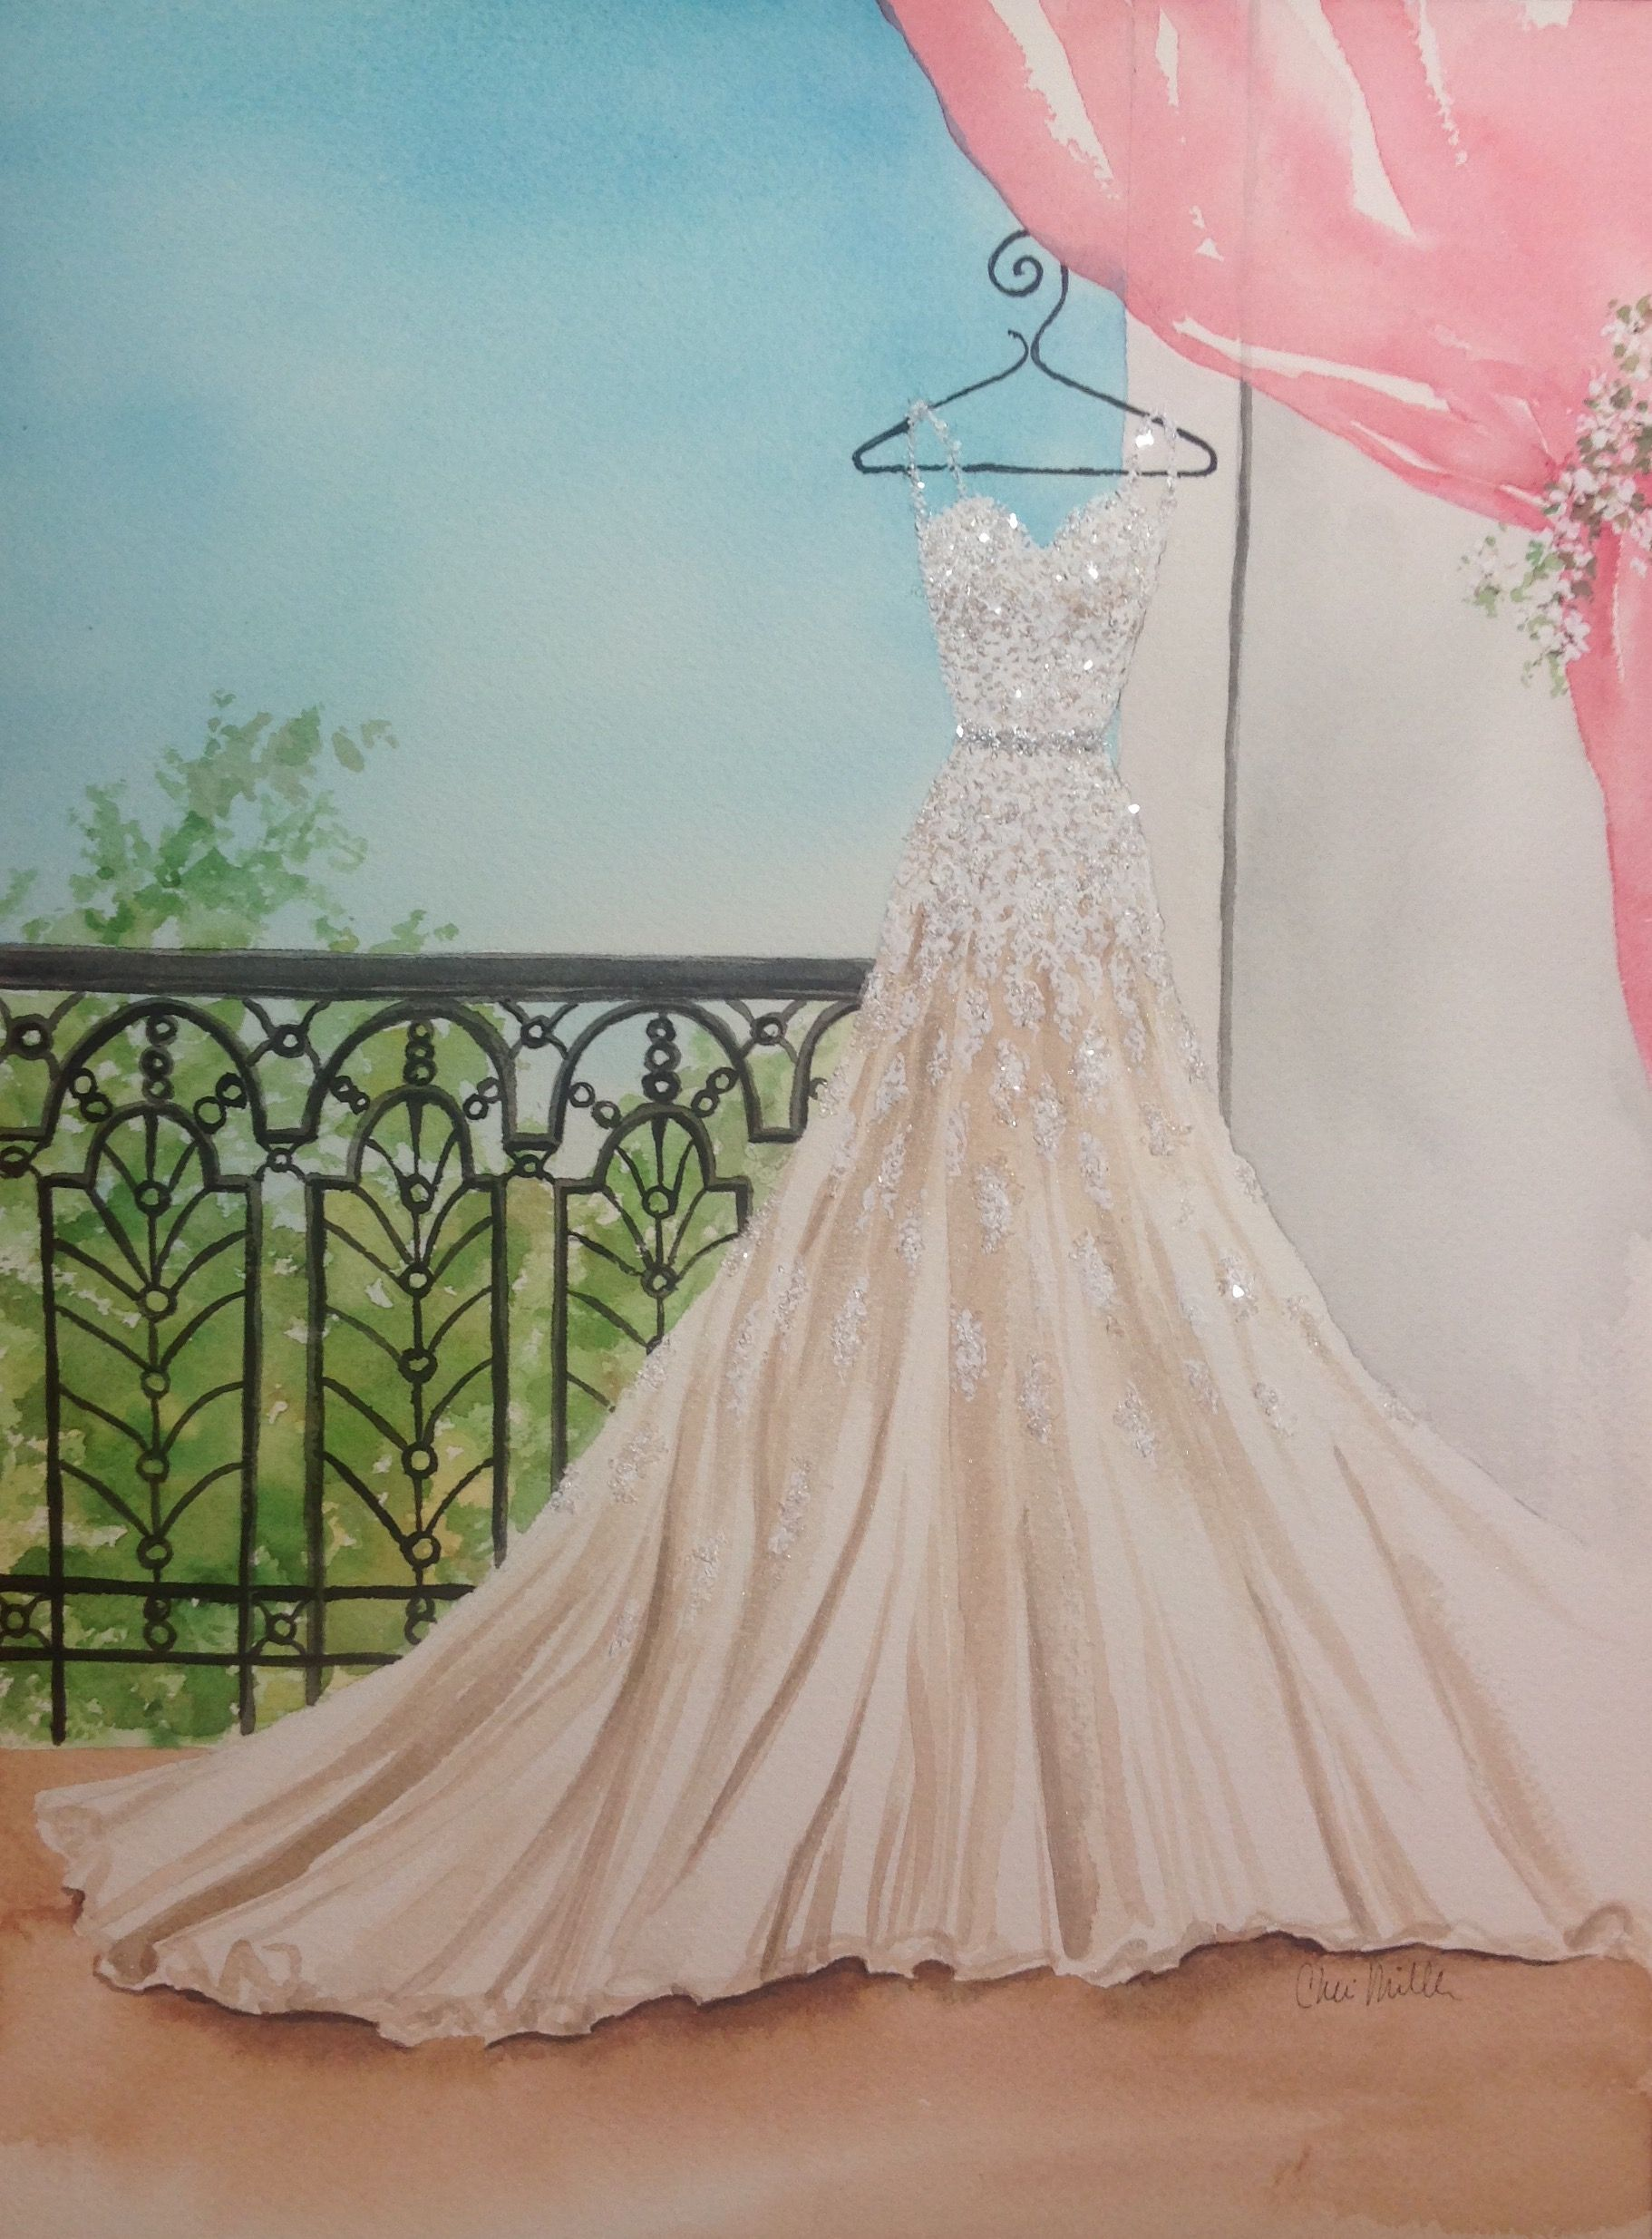 Bridal illustration by cheri miller personalized bespoke